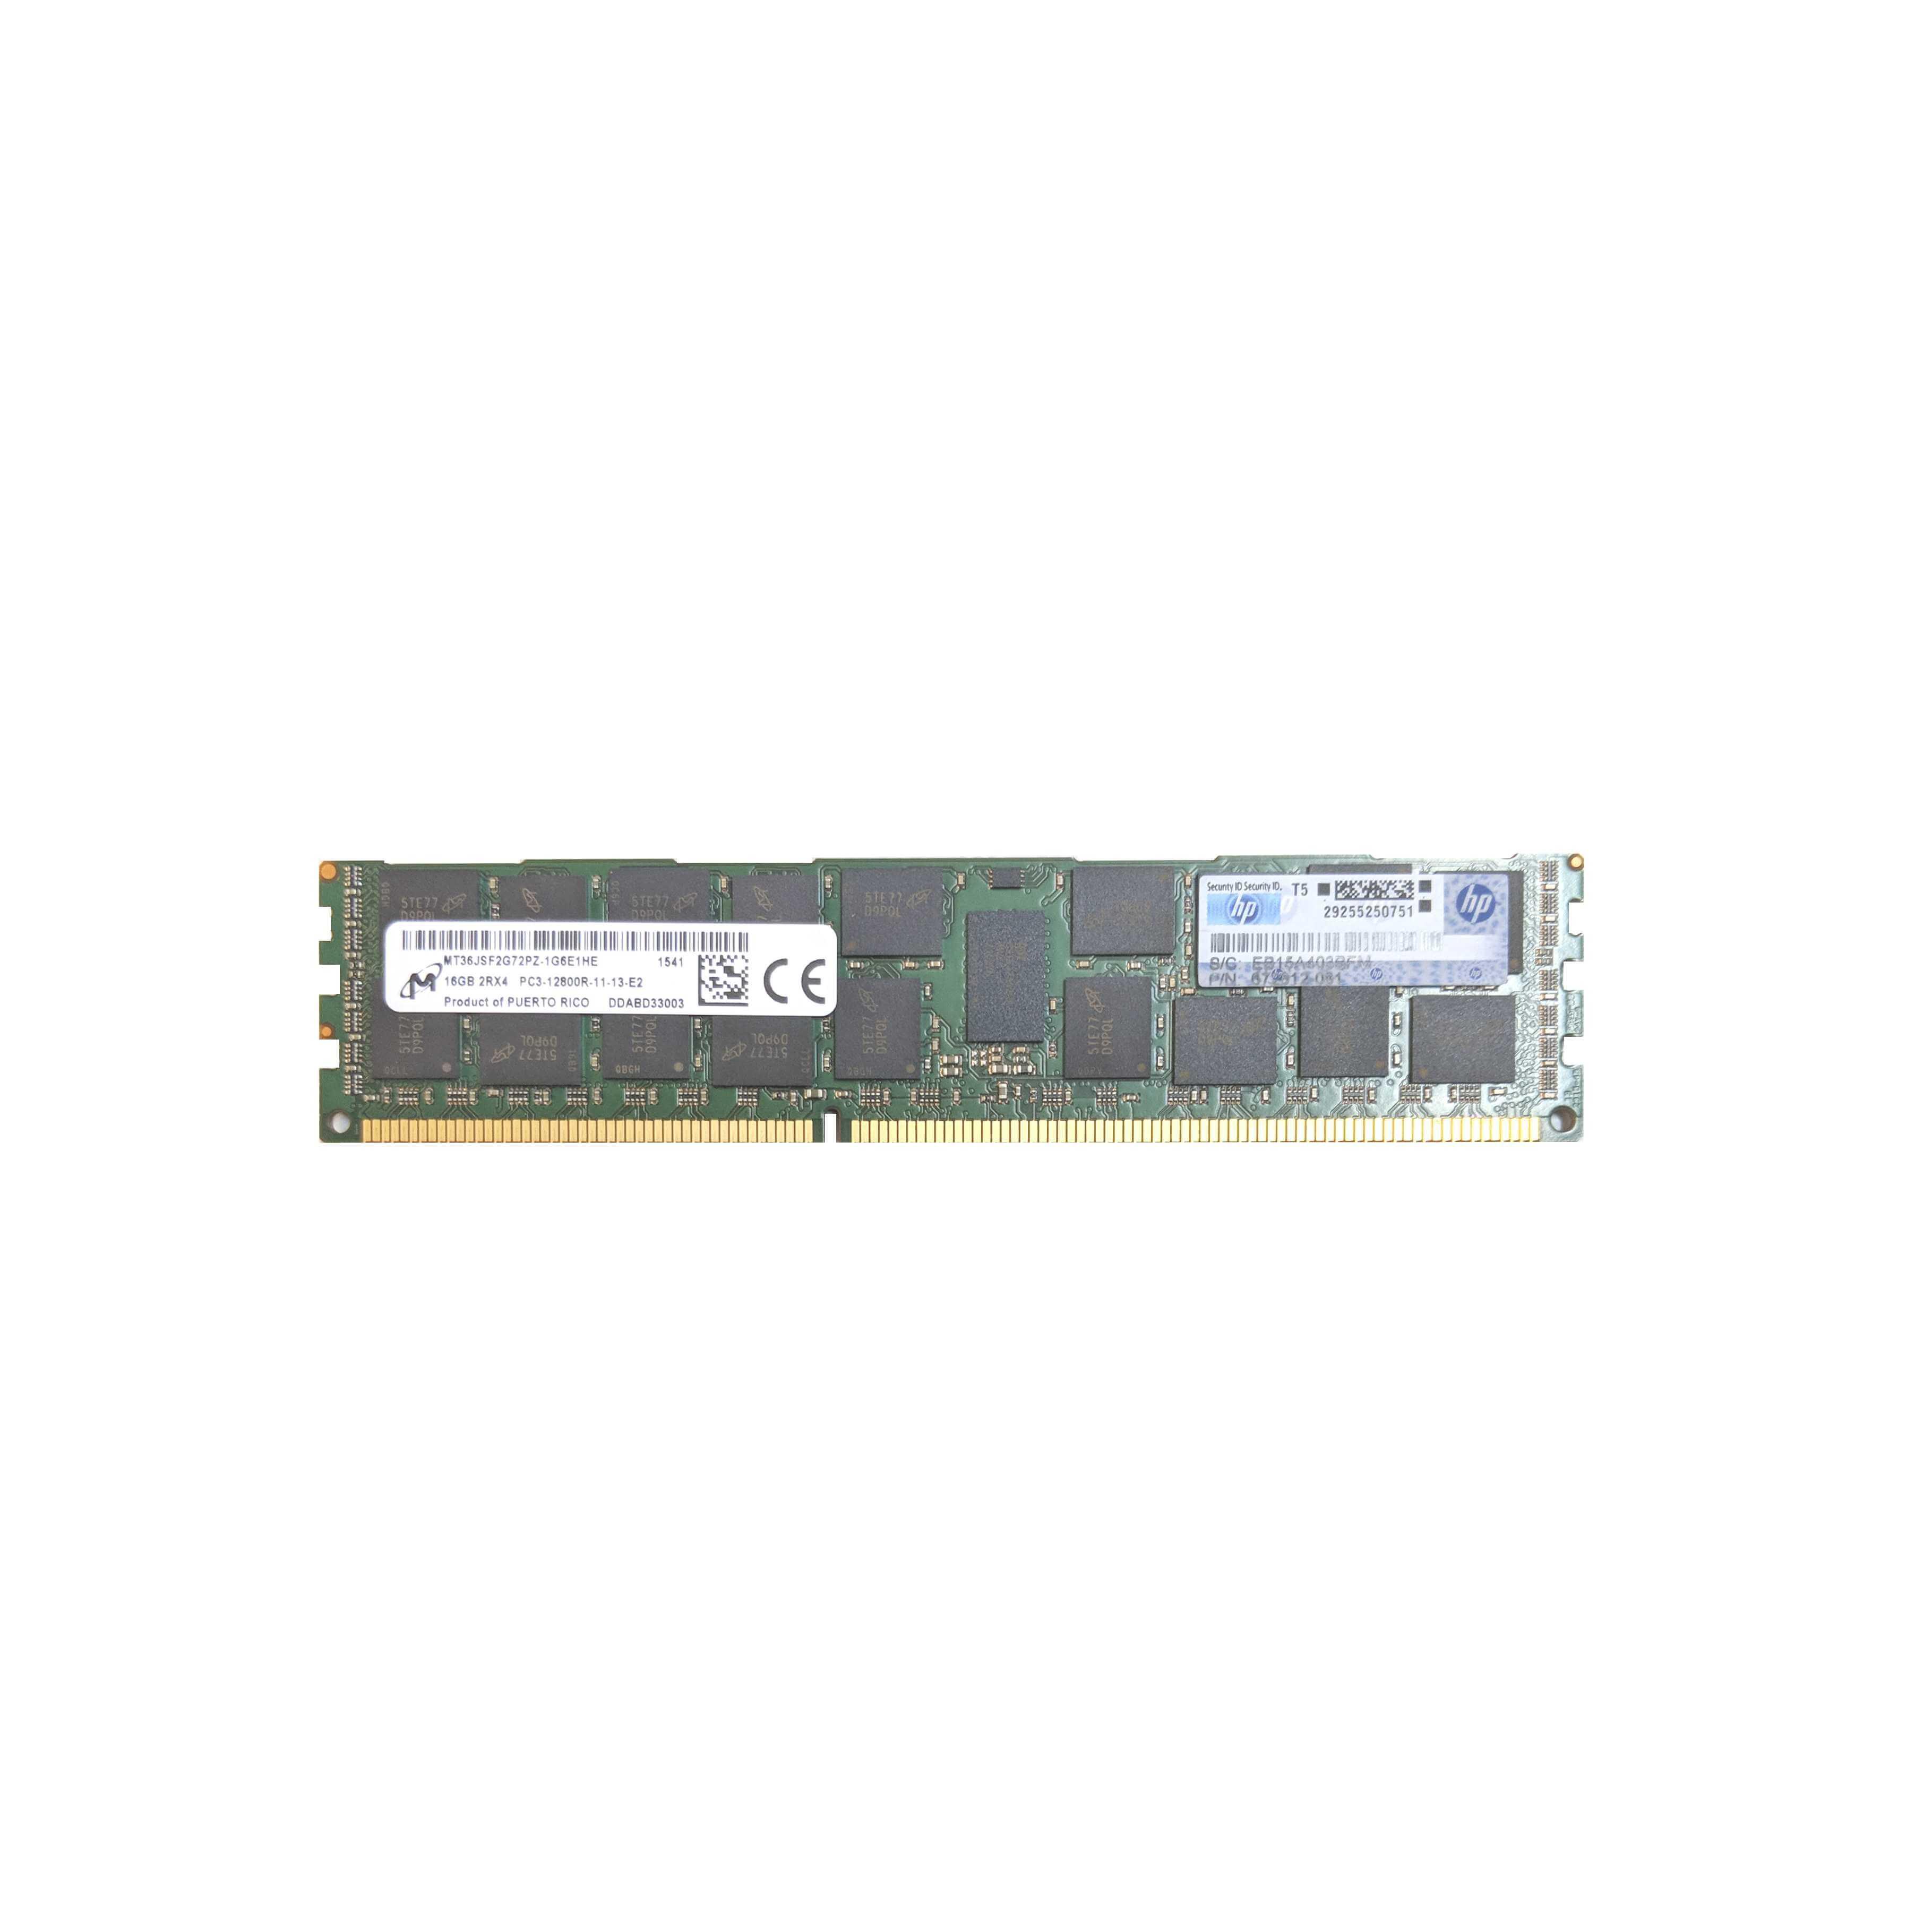 Hp 16gb Ddr3 Ecc Ram 12800r 672612 081 672631 B21 684031 001 Samsung Memory Server Pc3 Rdimm